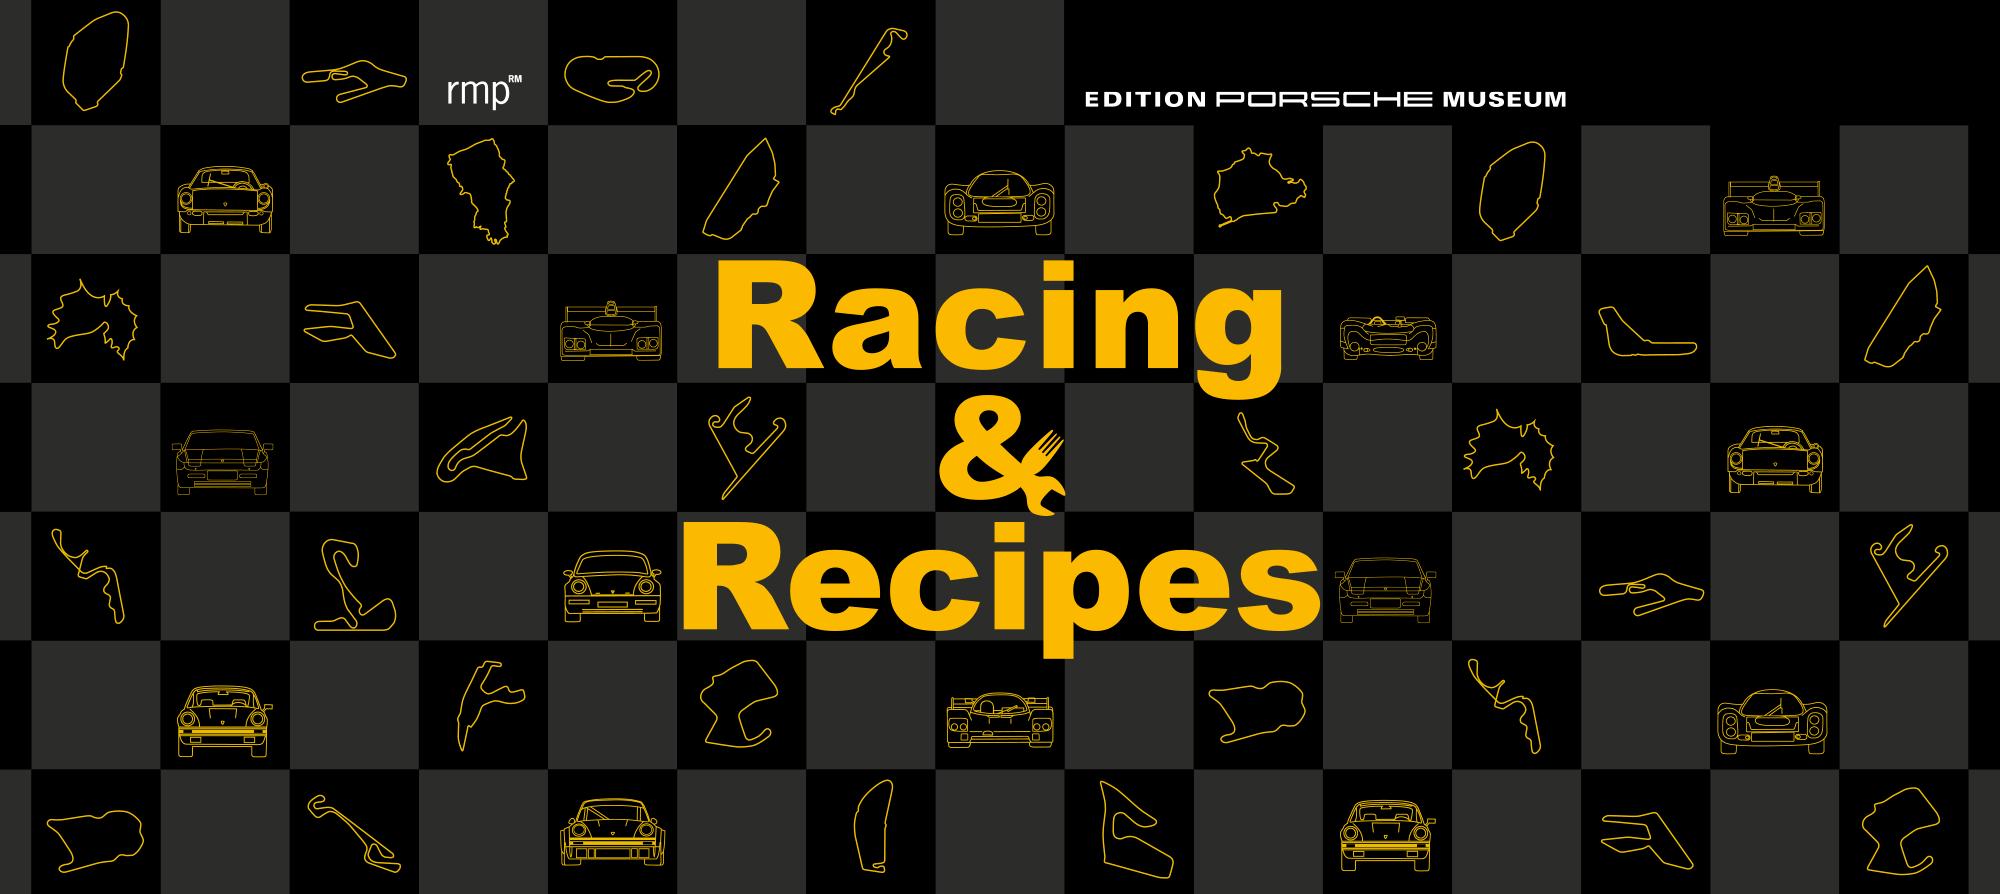 the racing-cookbook